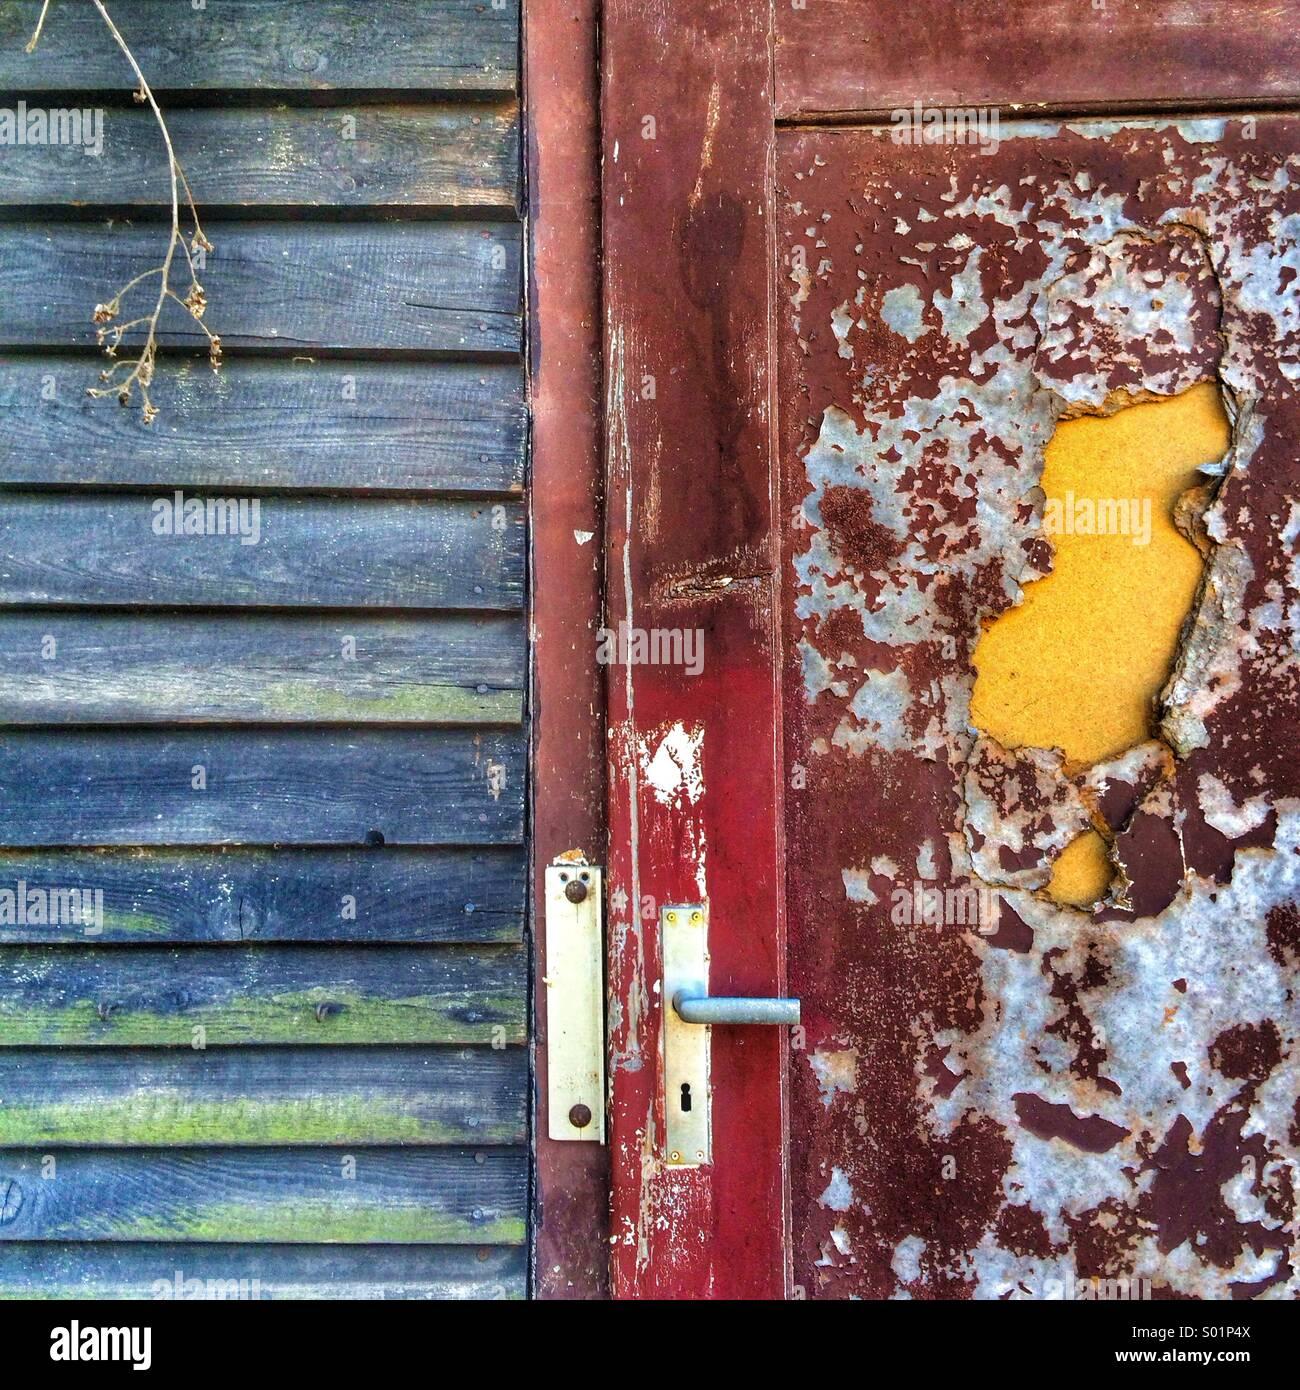 Shed door - Stock Image